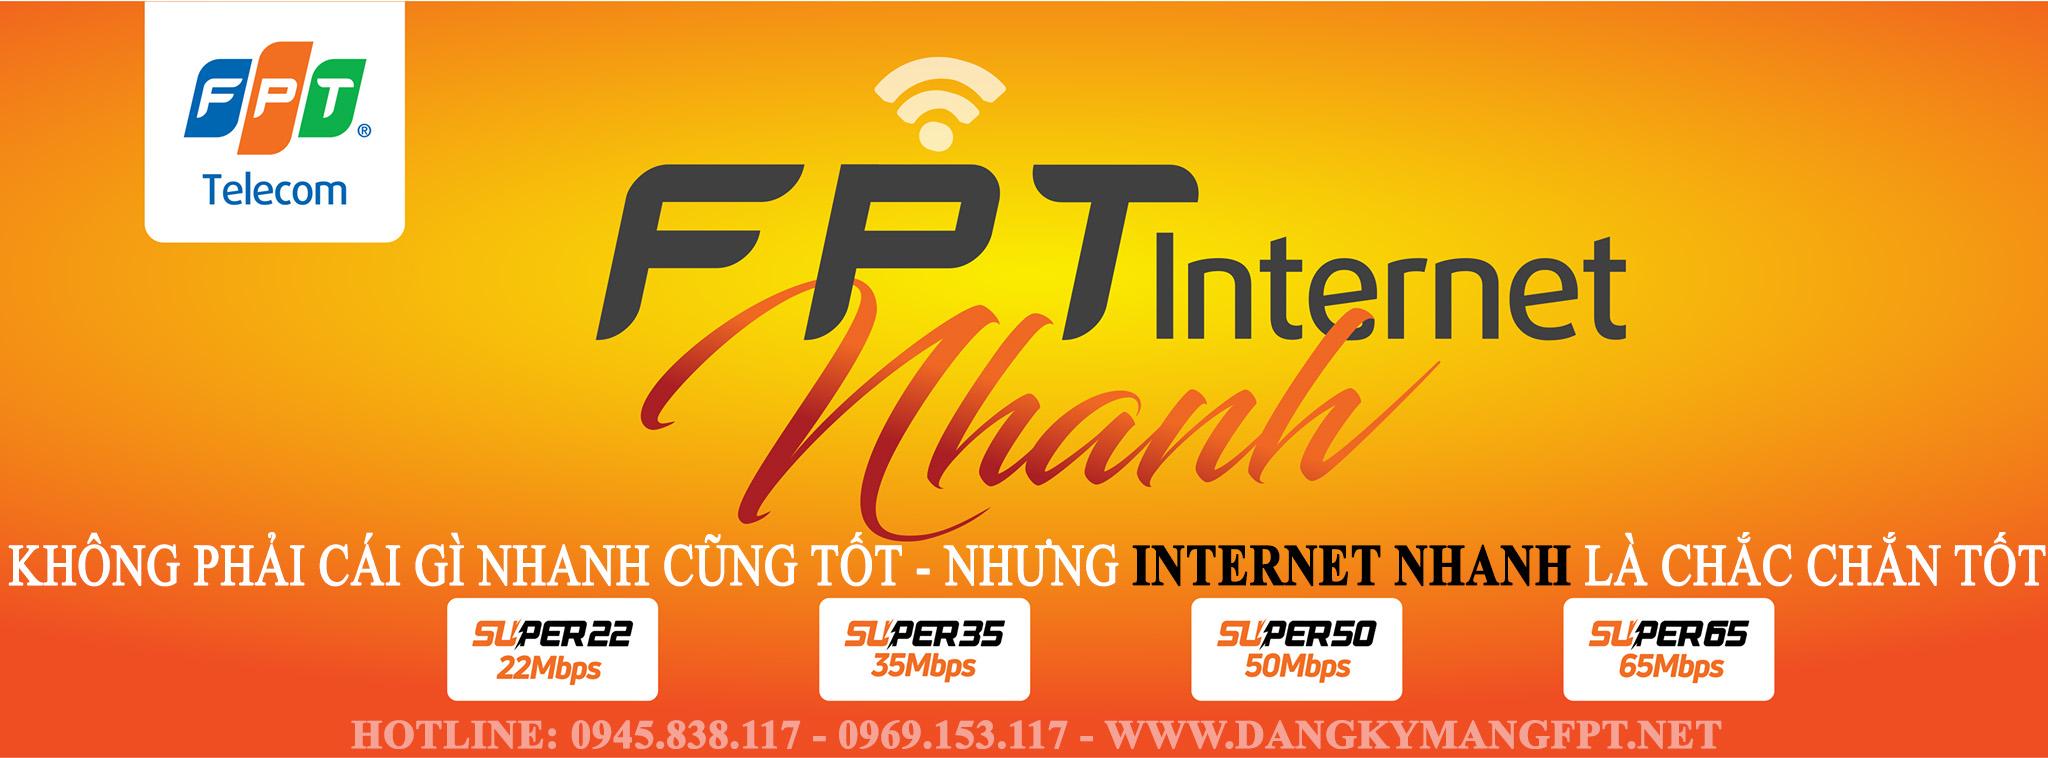 banner dang ky mang internet fpt